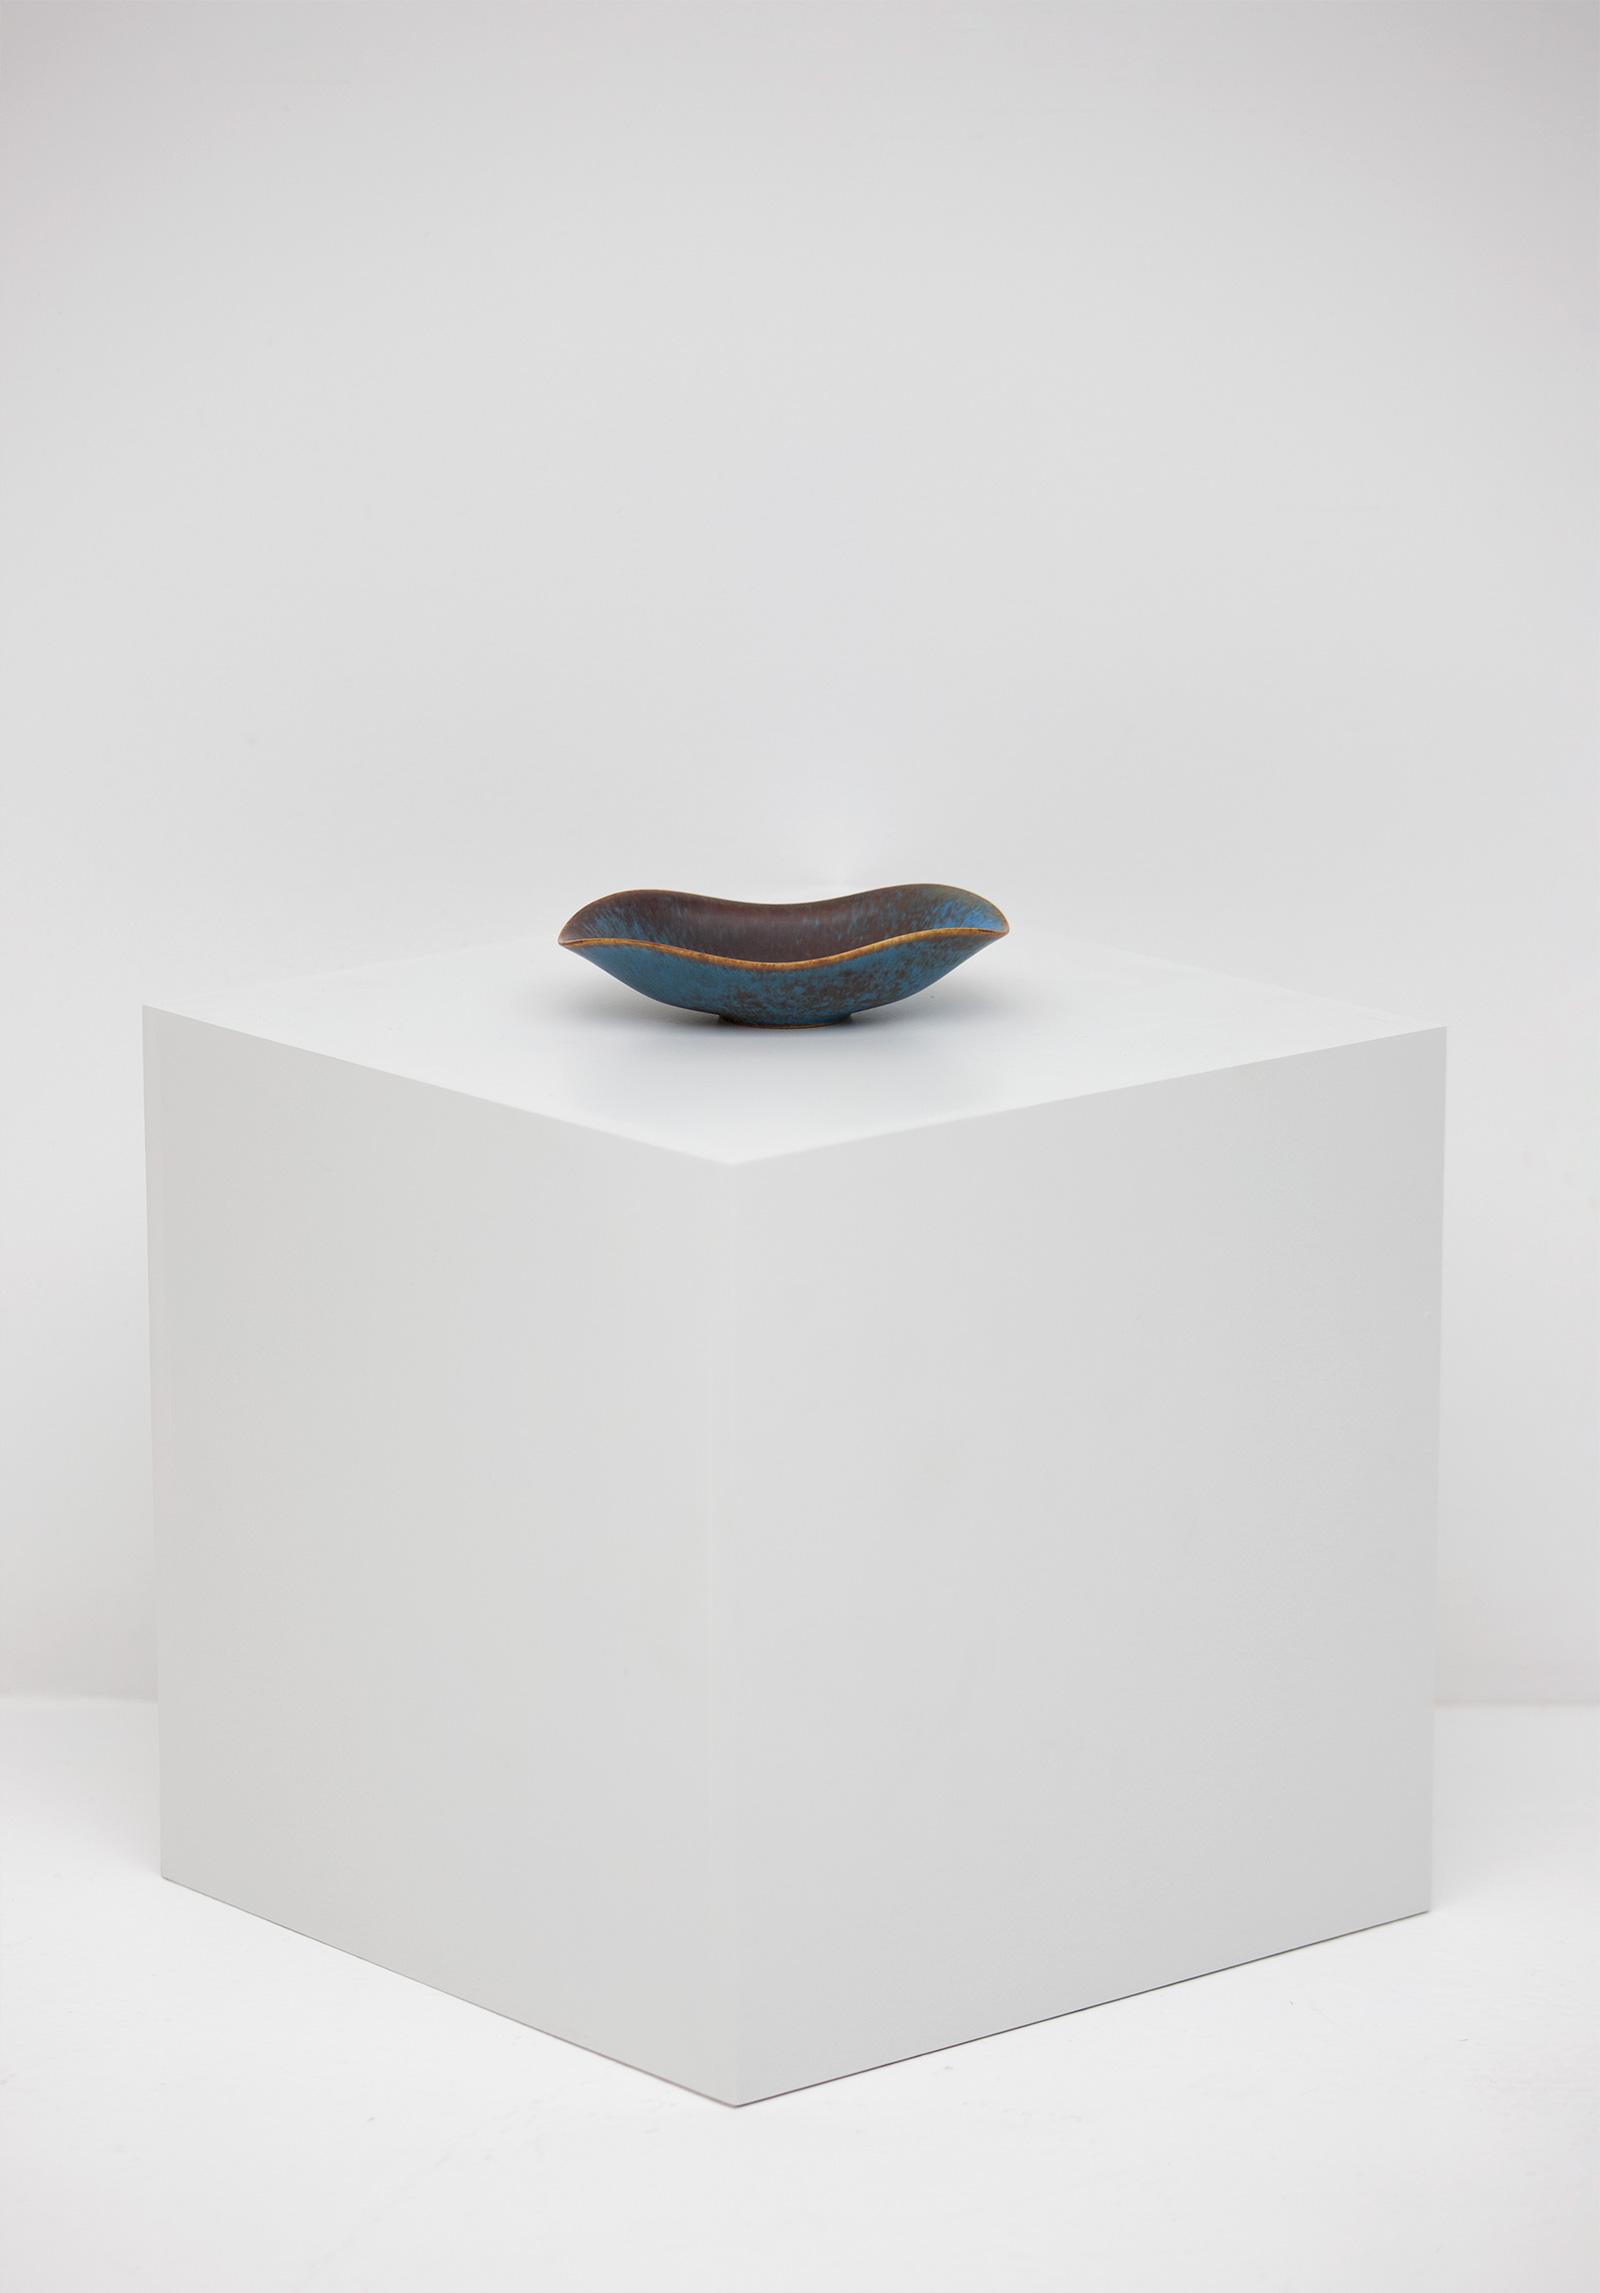 Gunnar Nylund For Rorstrand Ceramic